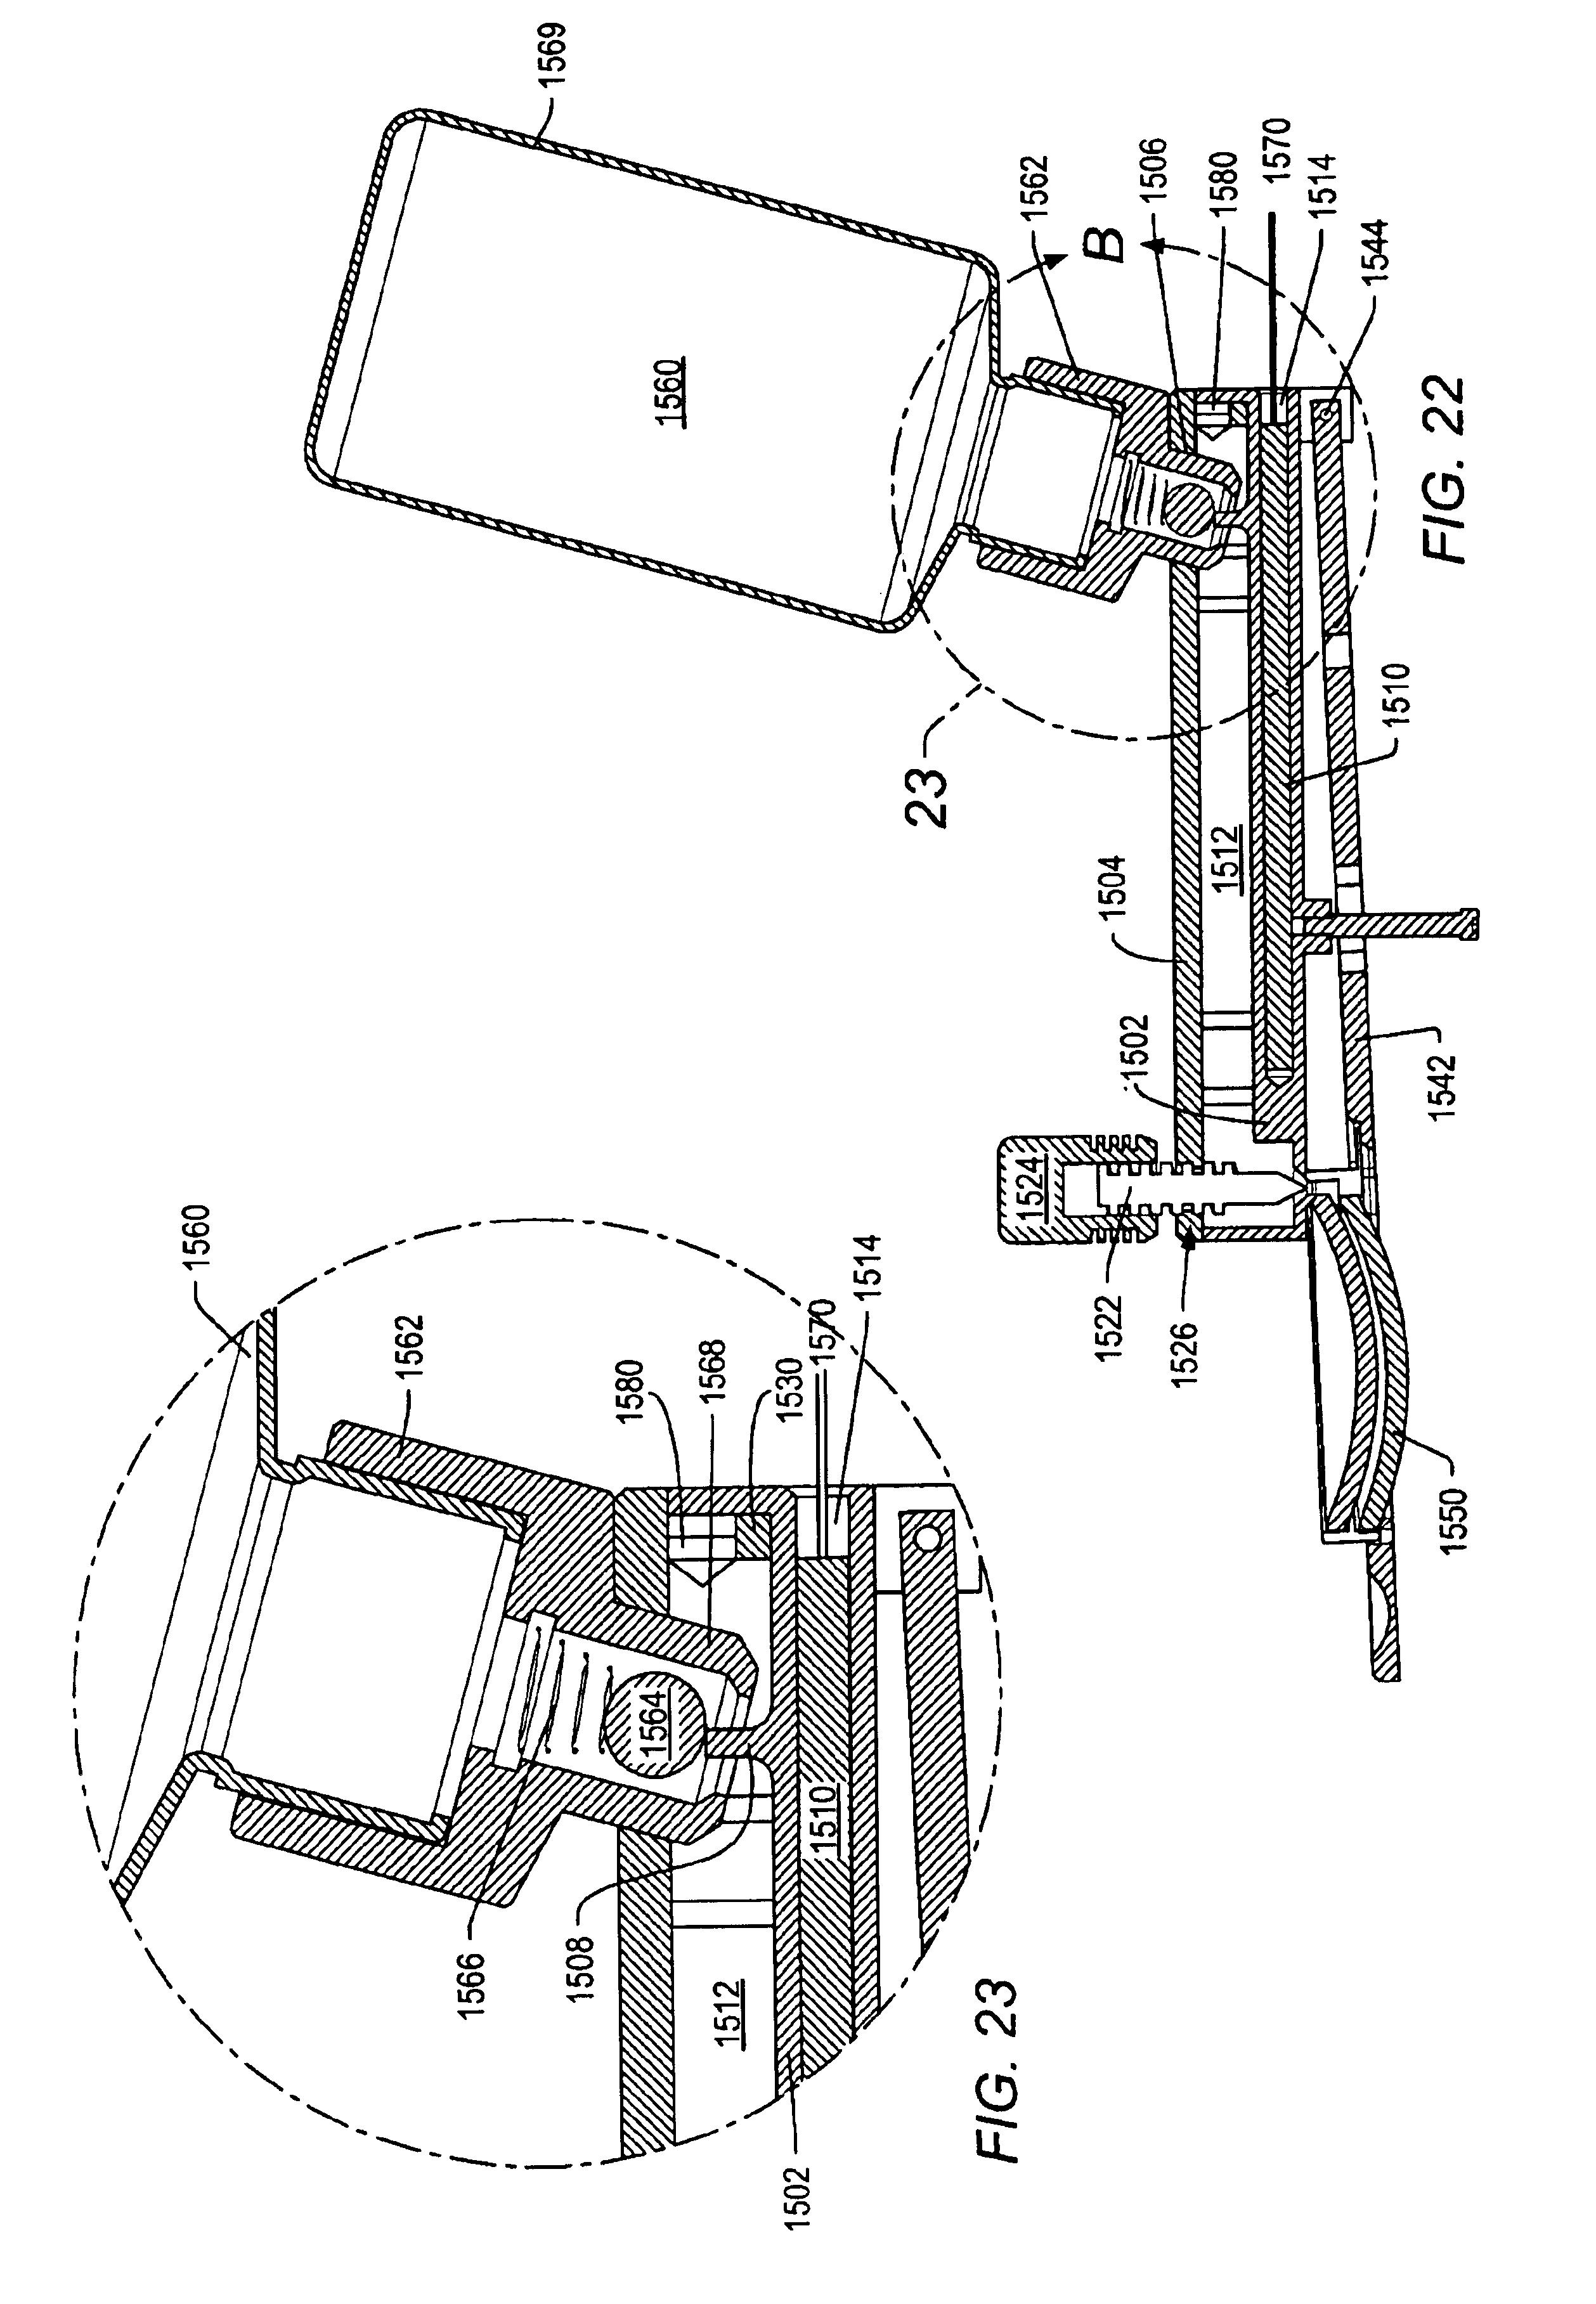 US6790024B2 - Apparatus for preparing an eyegl lens ... on